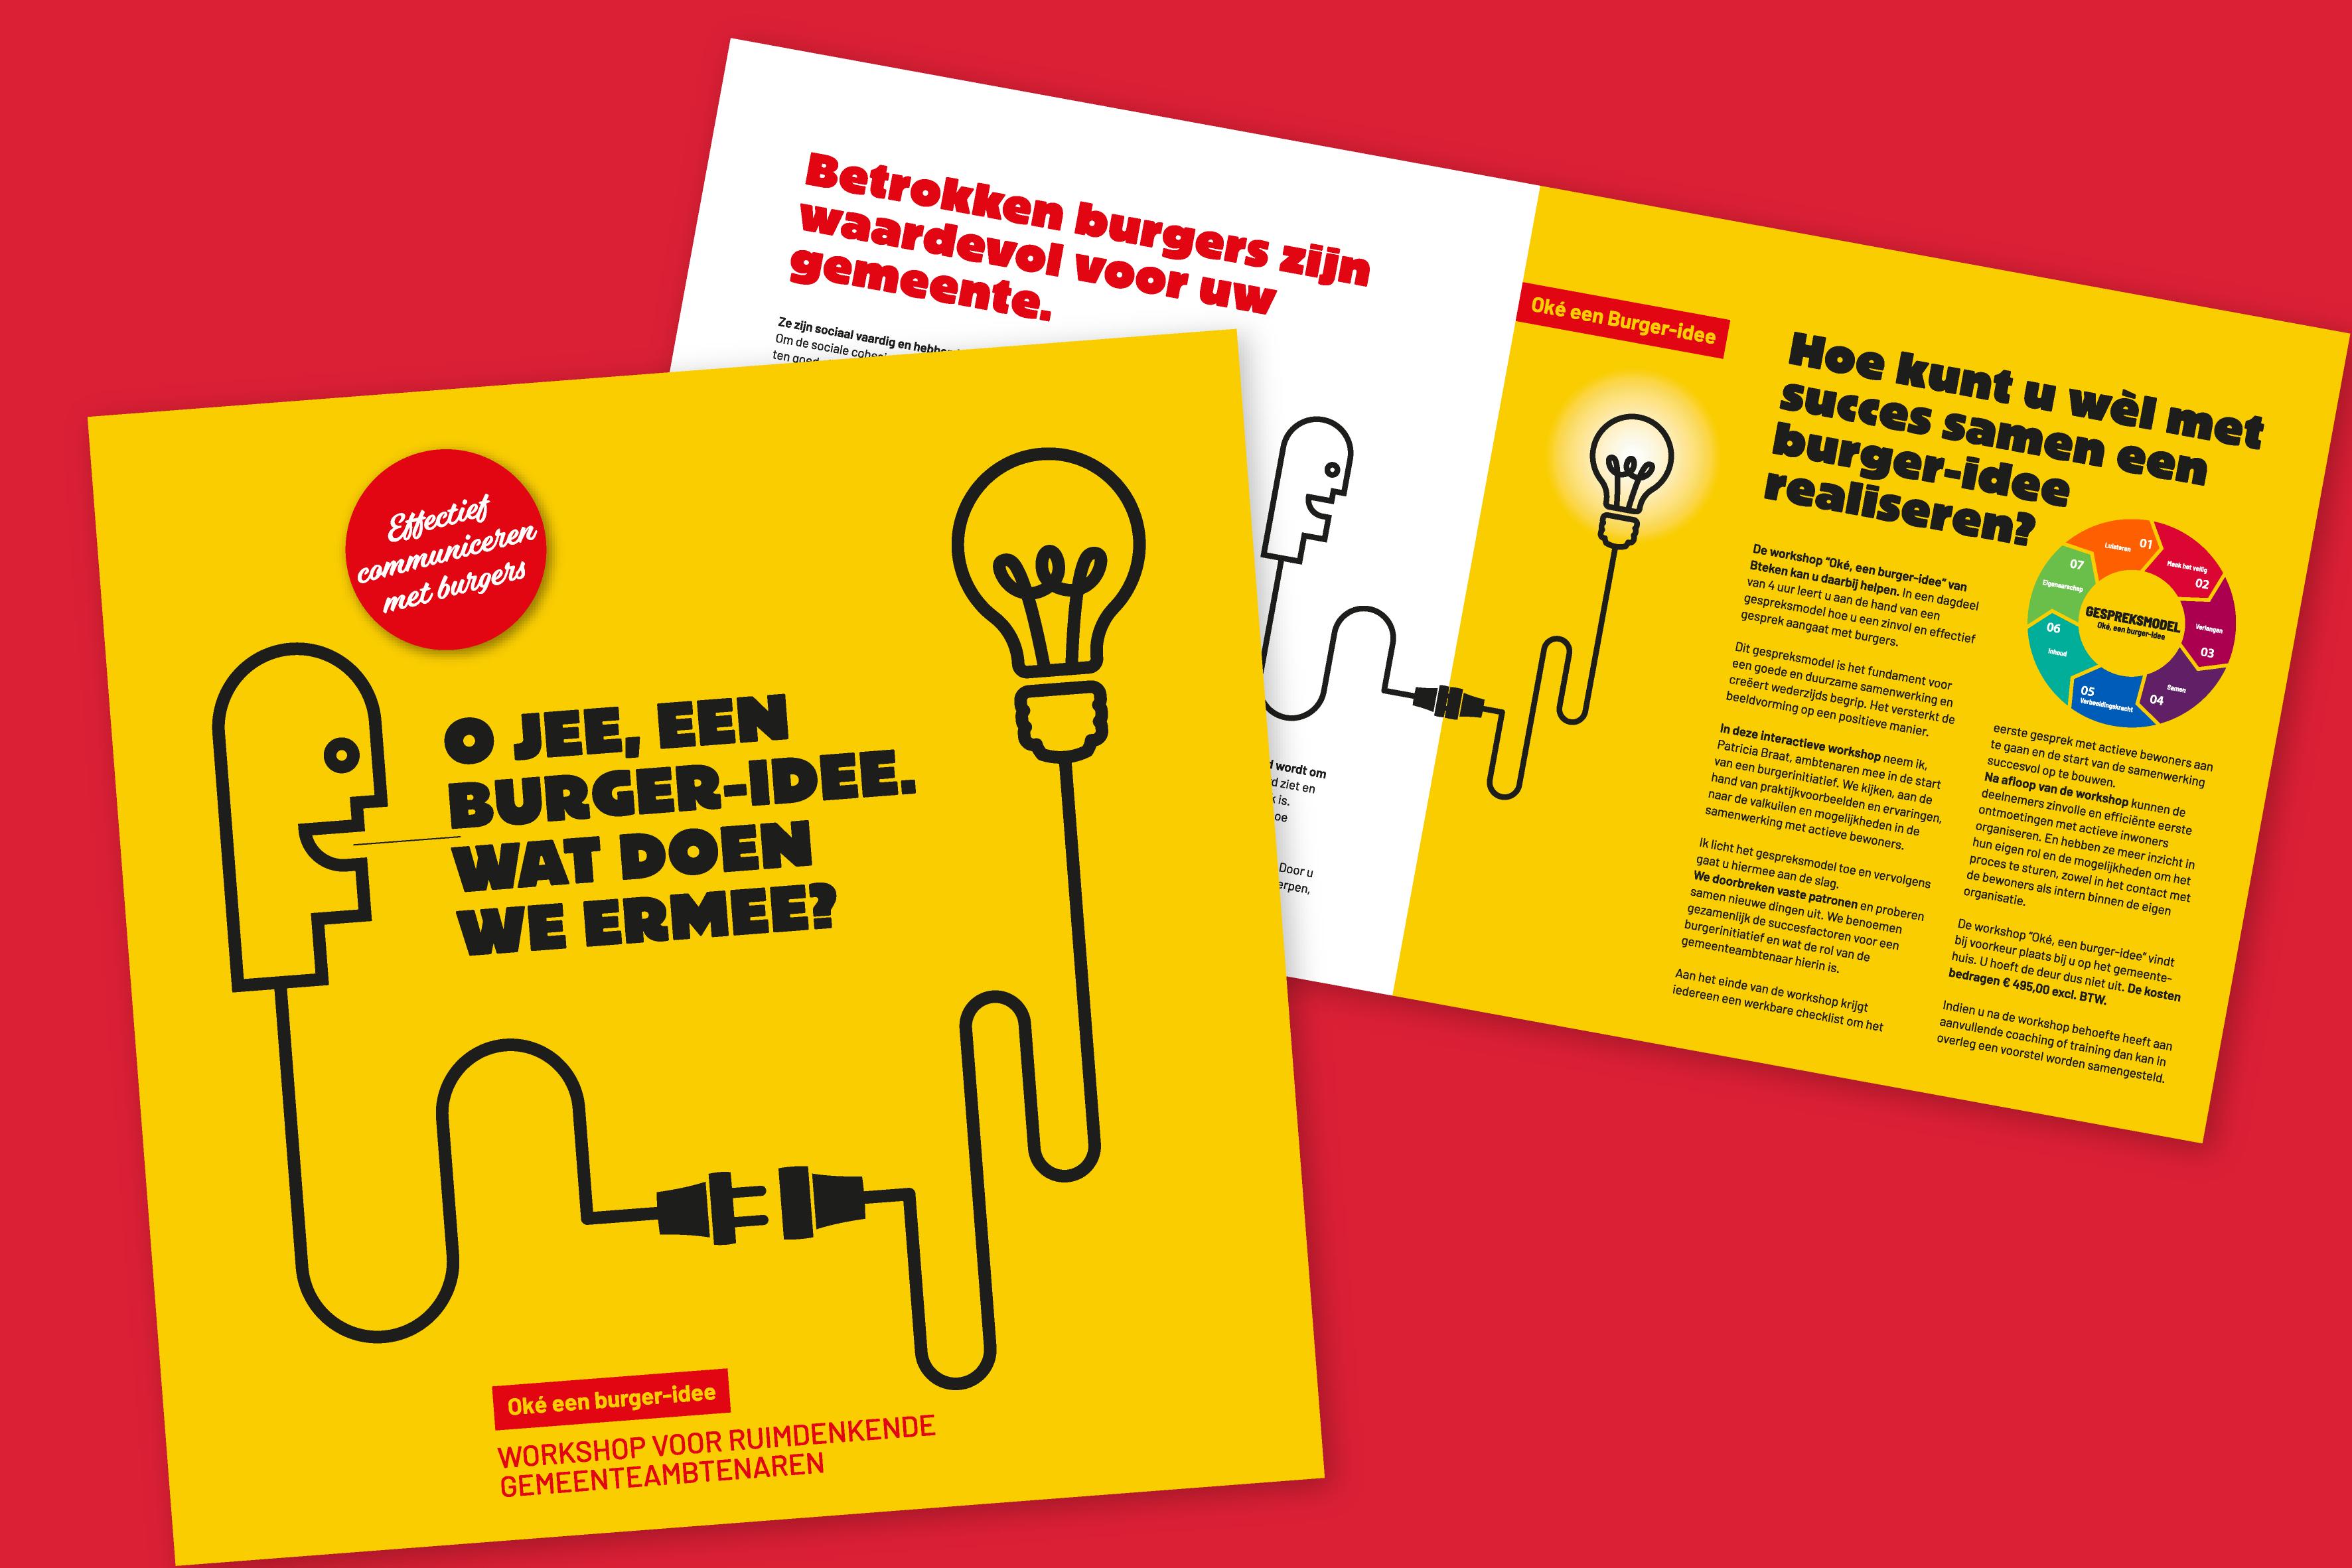 Bteken folder workshop burger-idee